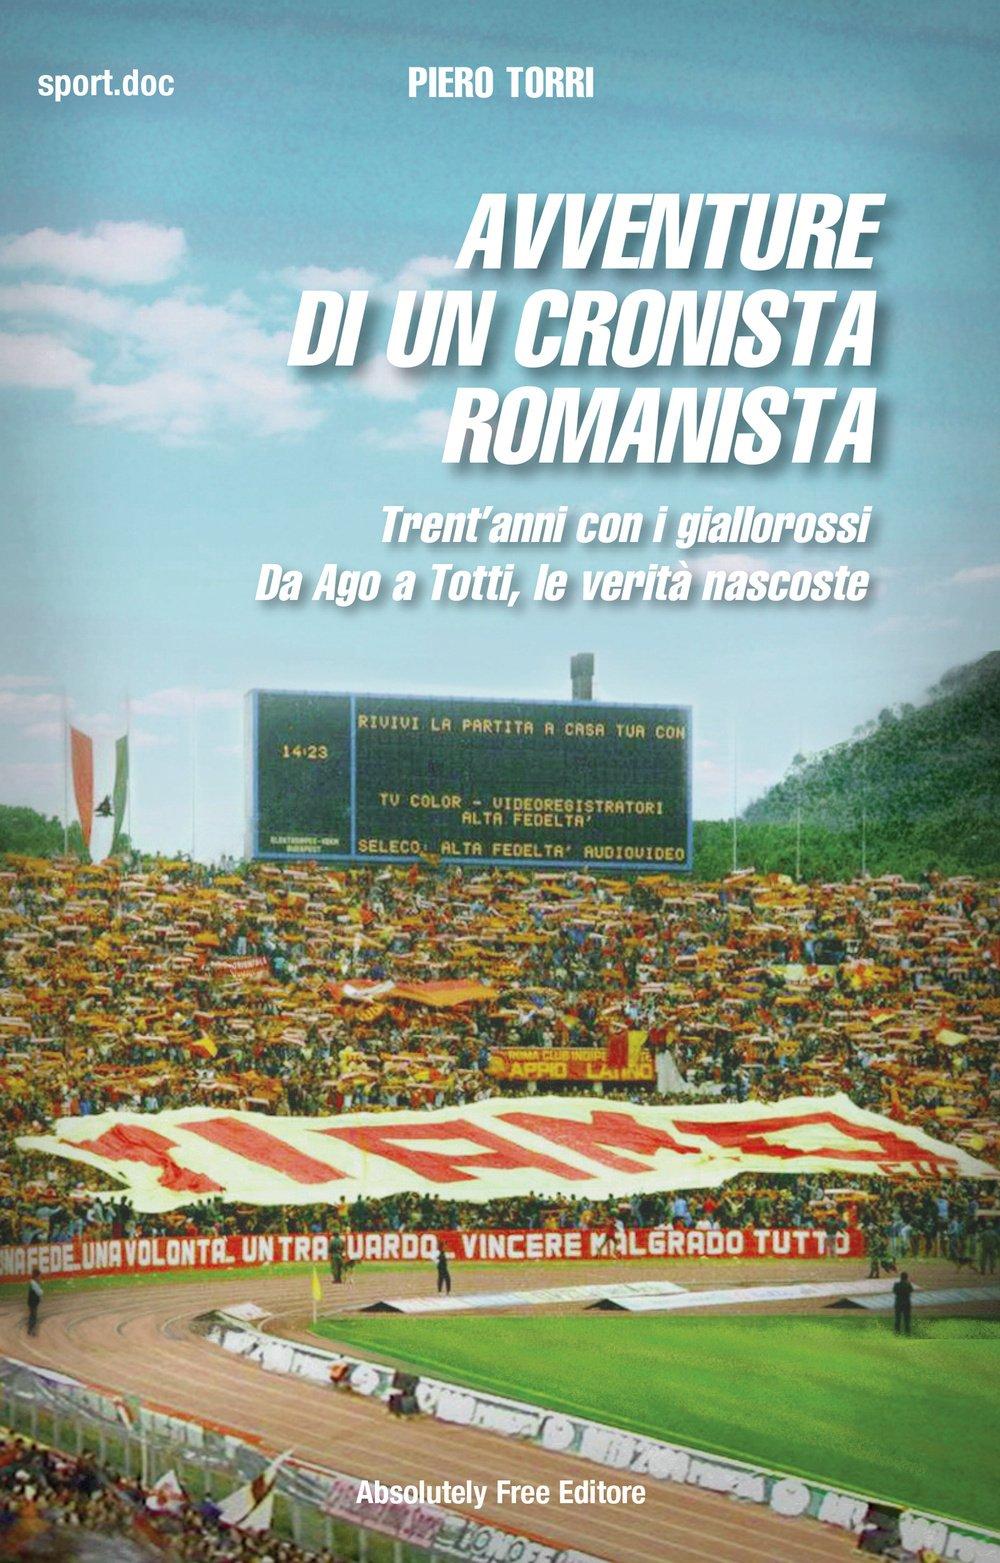 Avventure di un cronista romanista